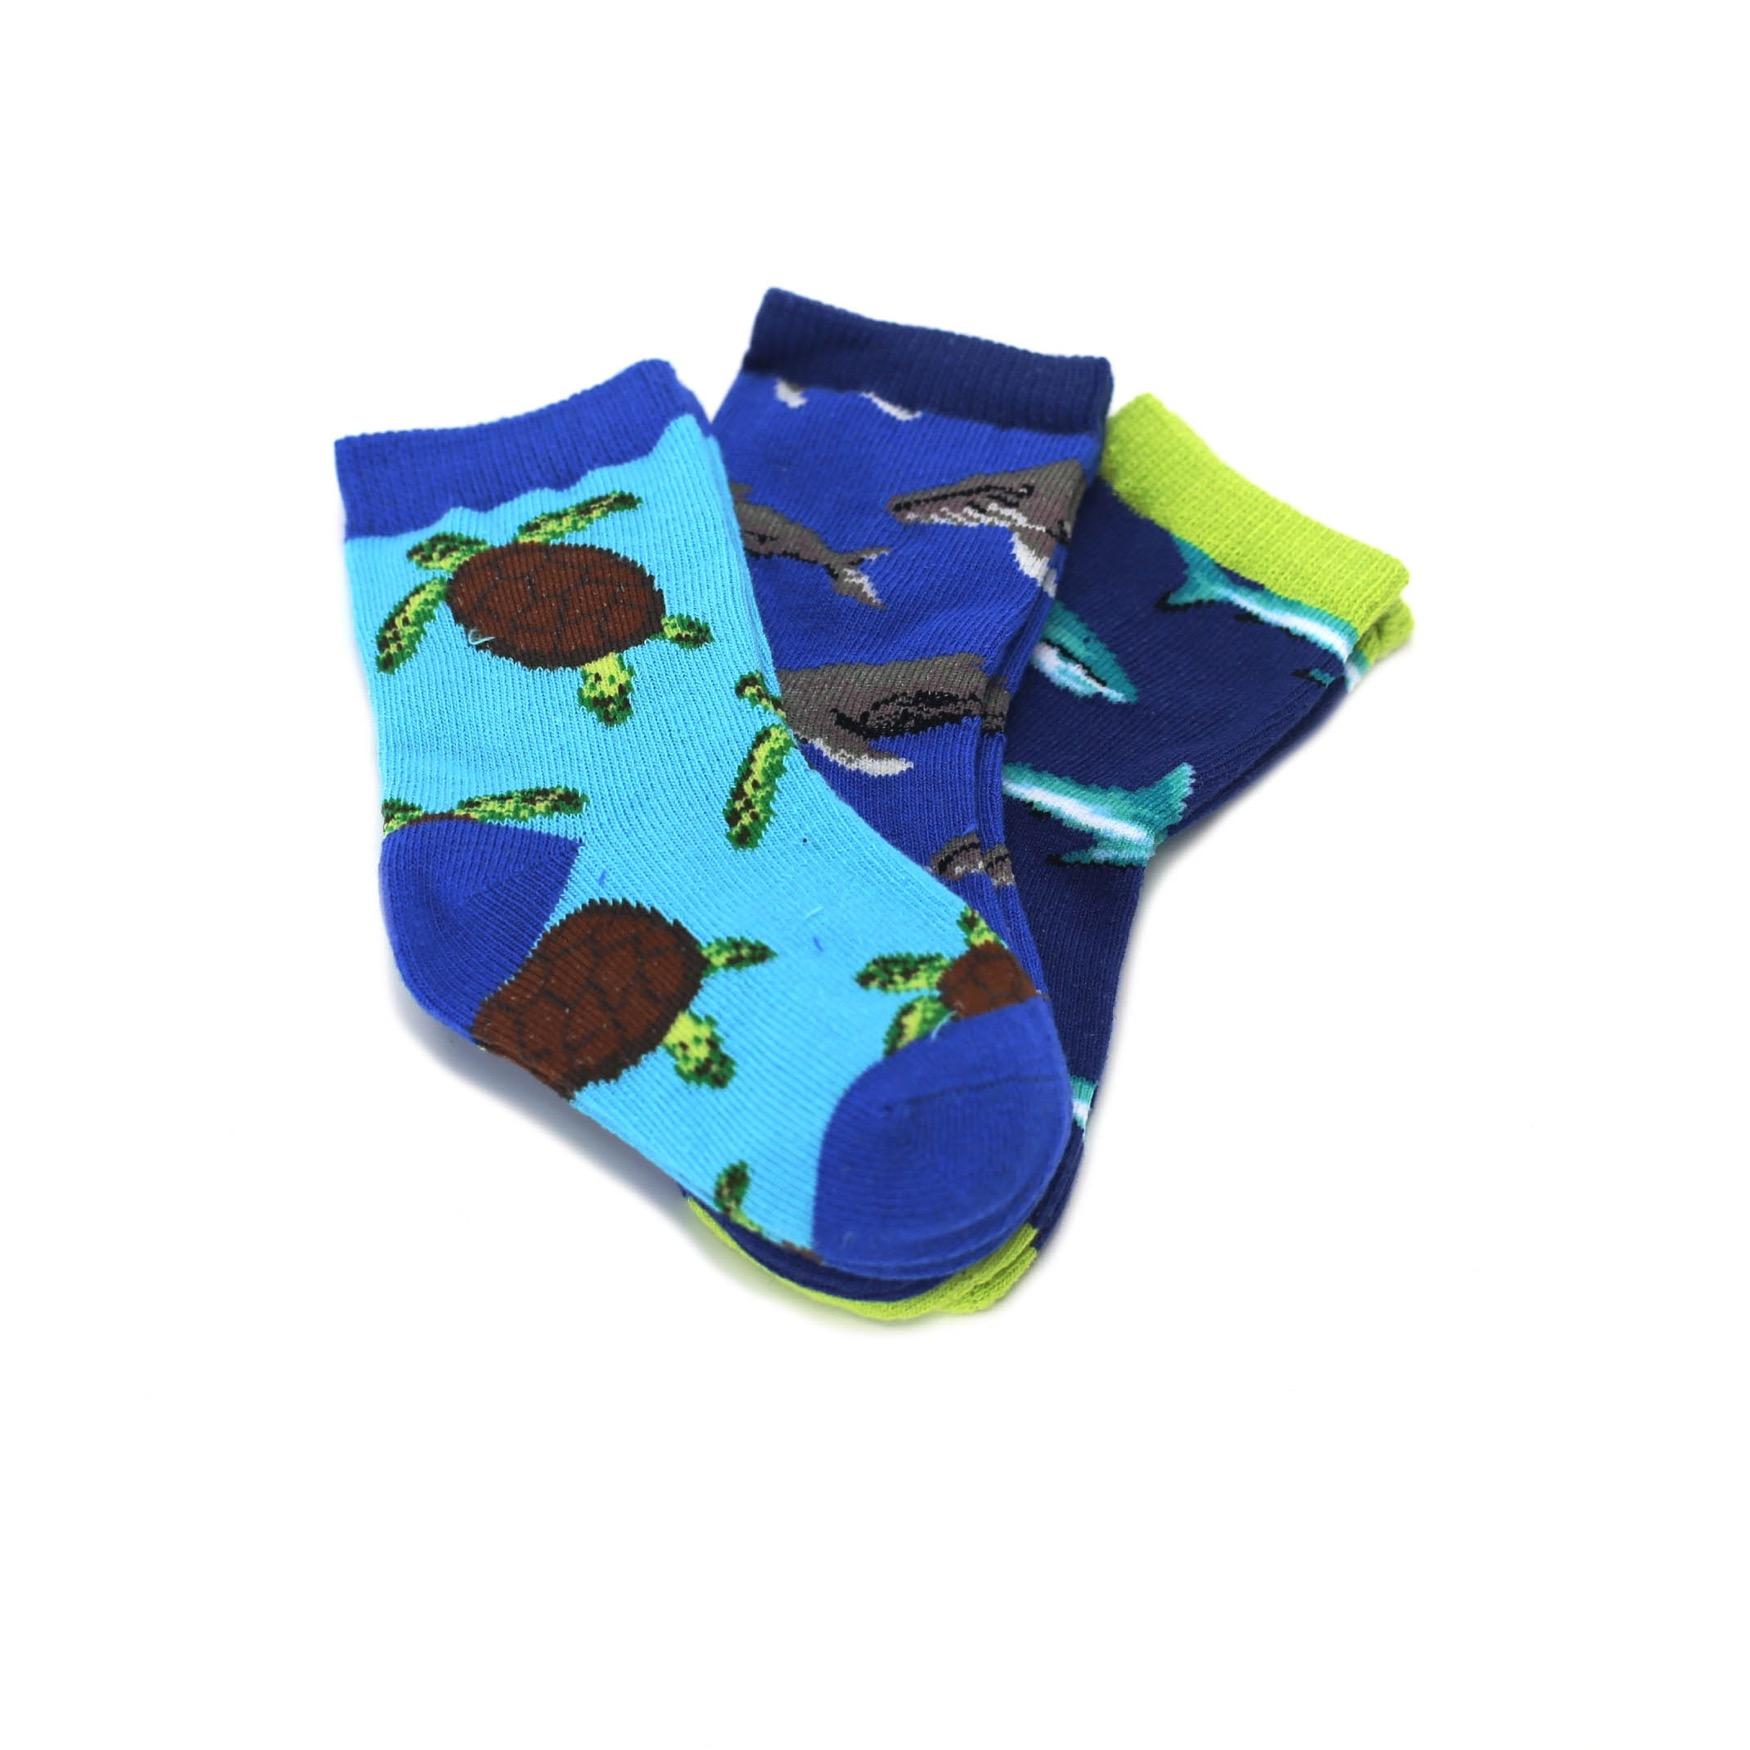 Ocean Animals Toddler Dress Socks 3 Pairs Socksmith